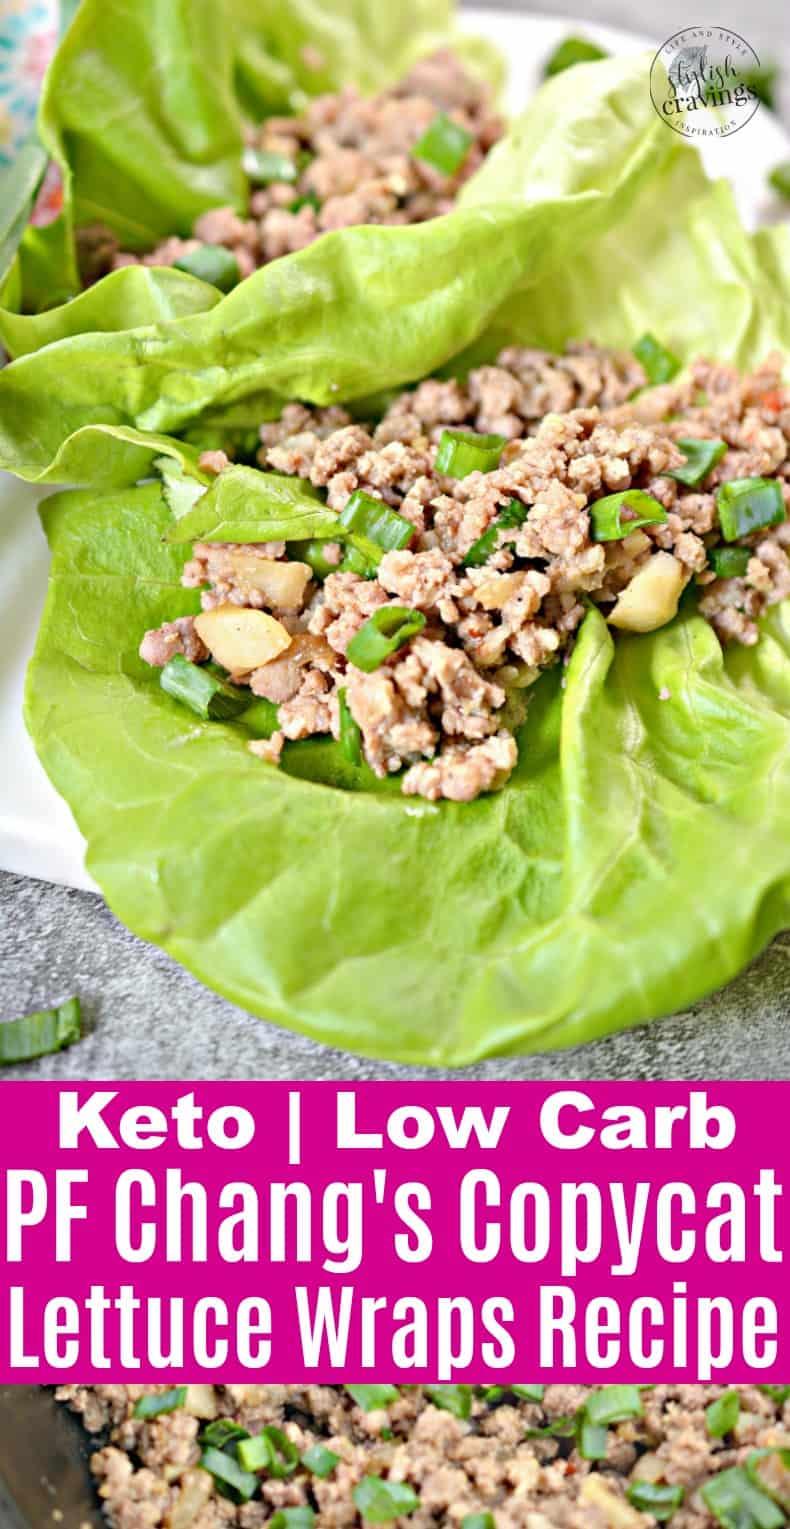 Keto PF Chang's Lettuce Wraps Copycat Recipe